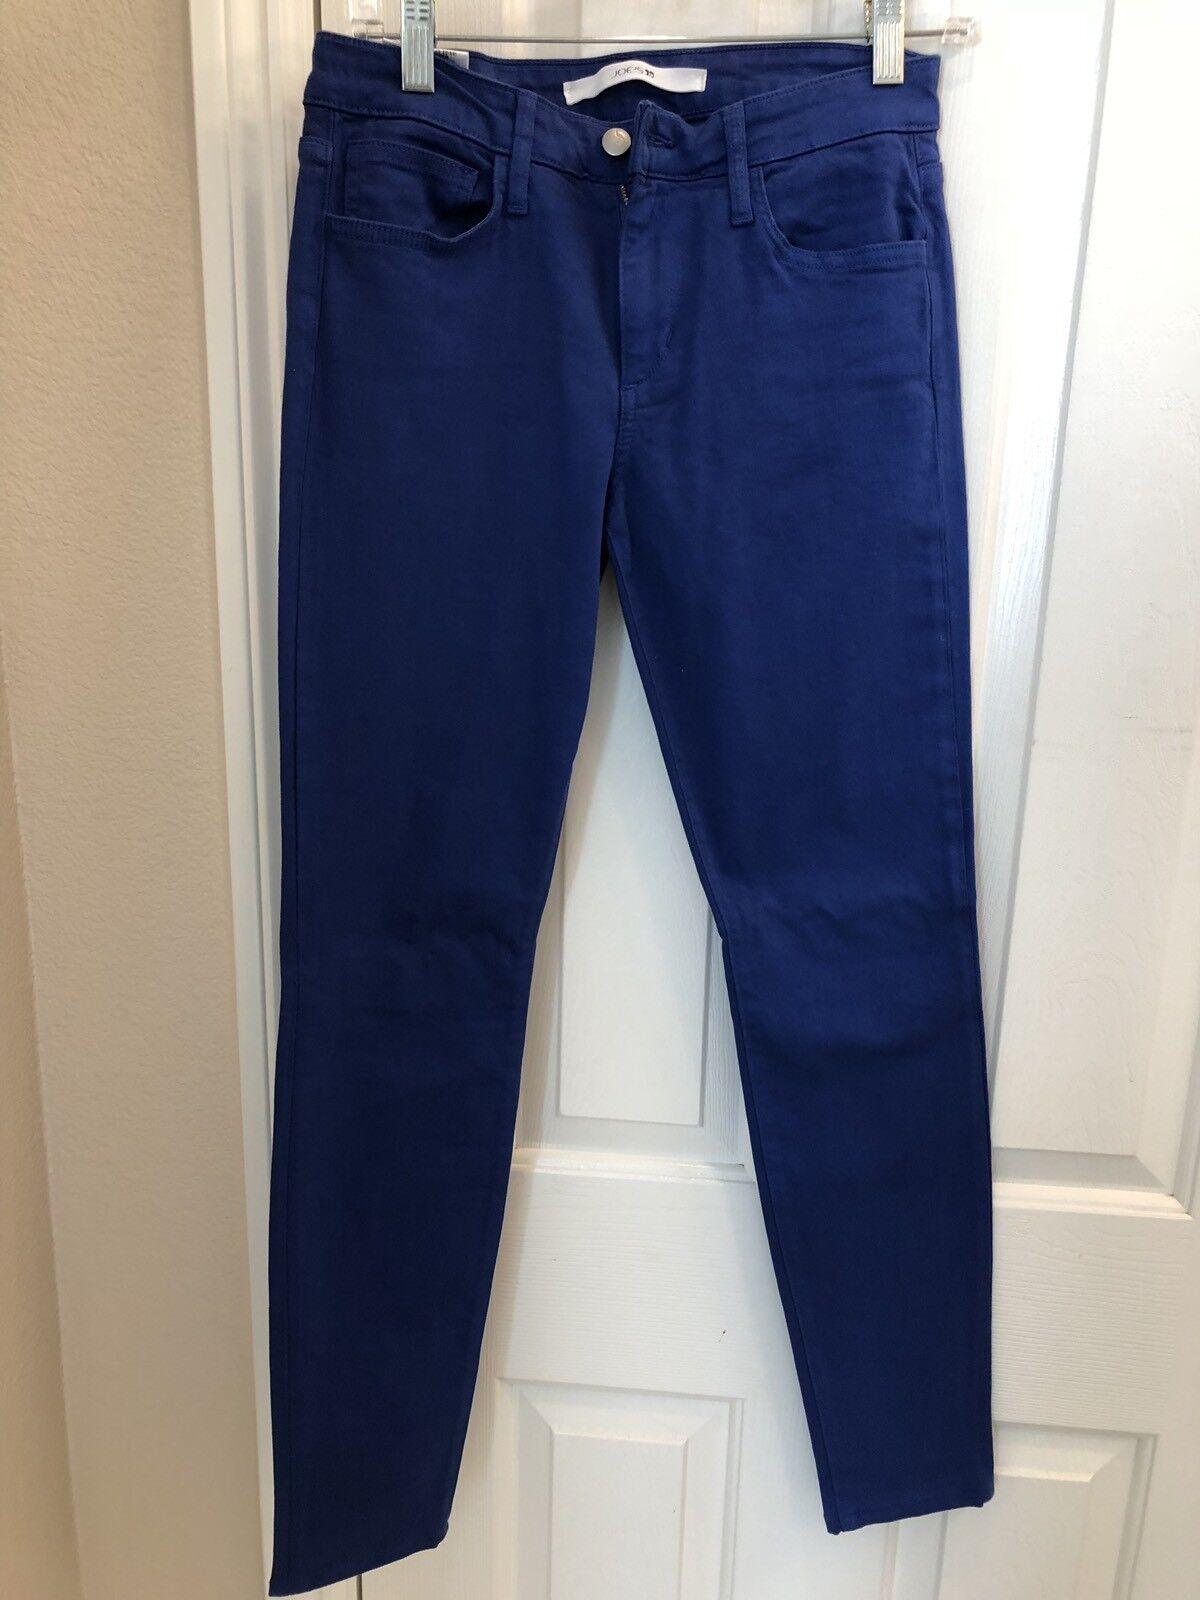 NWOT   Women's JOE'S JEANS Royal bluee color - The Skinny - Size 28